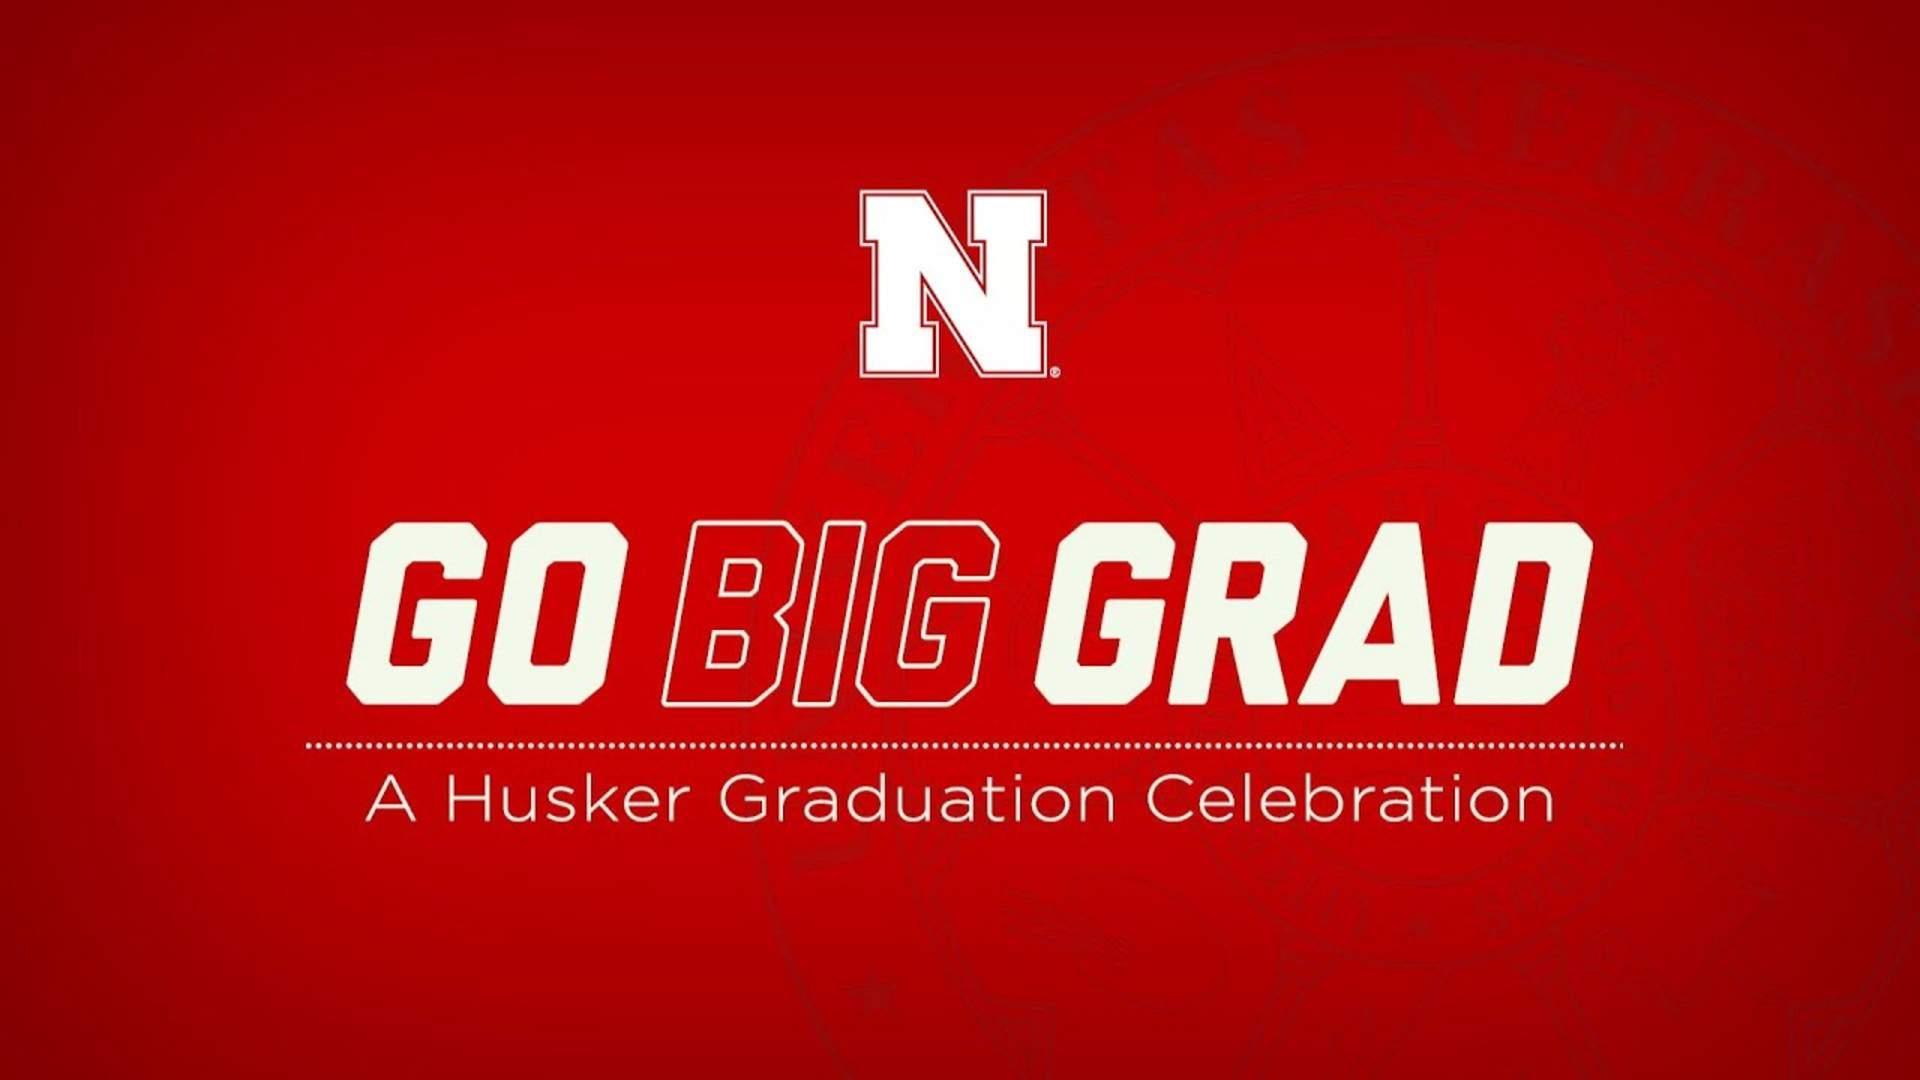 Go Big Grad: A Husker Graduation Celebration - August 15